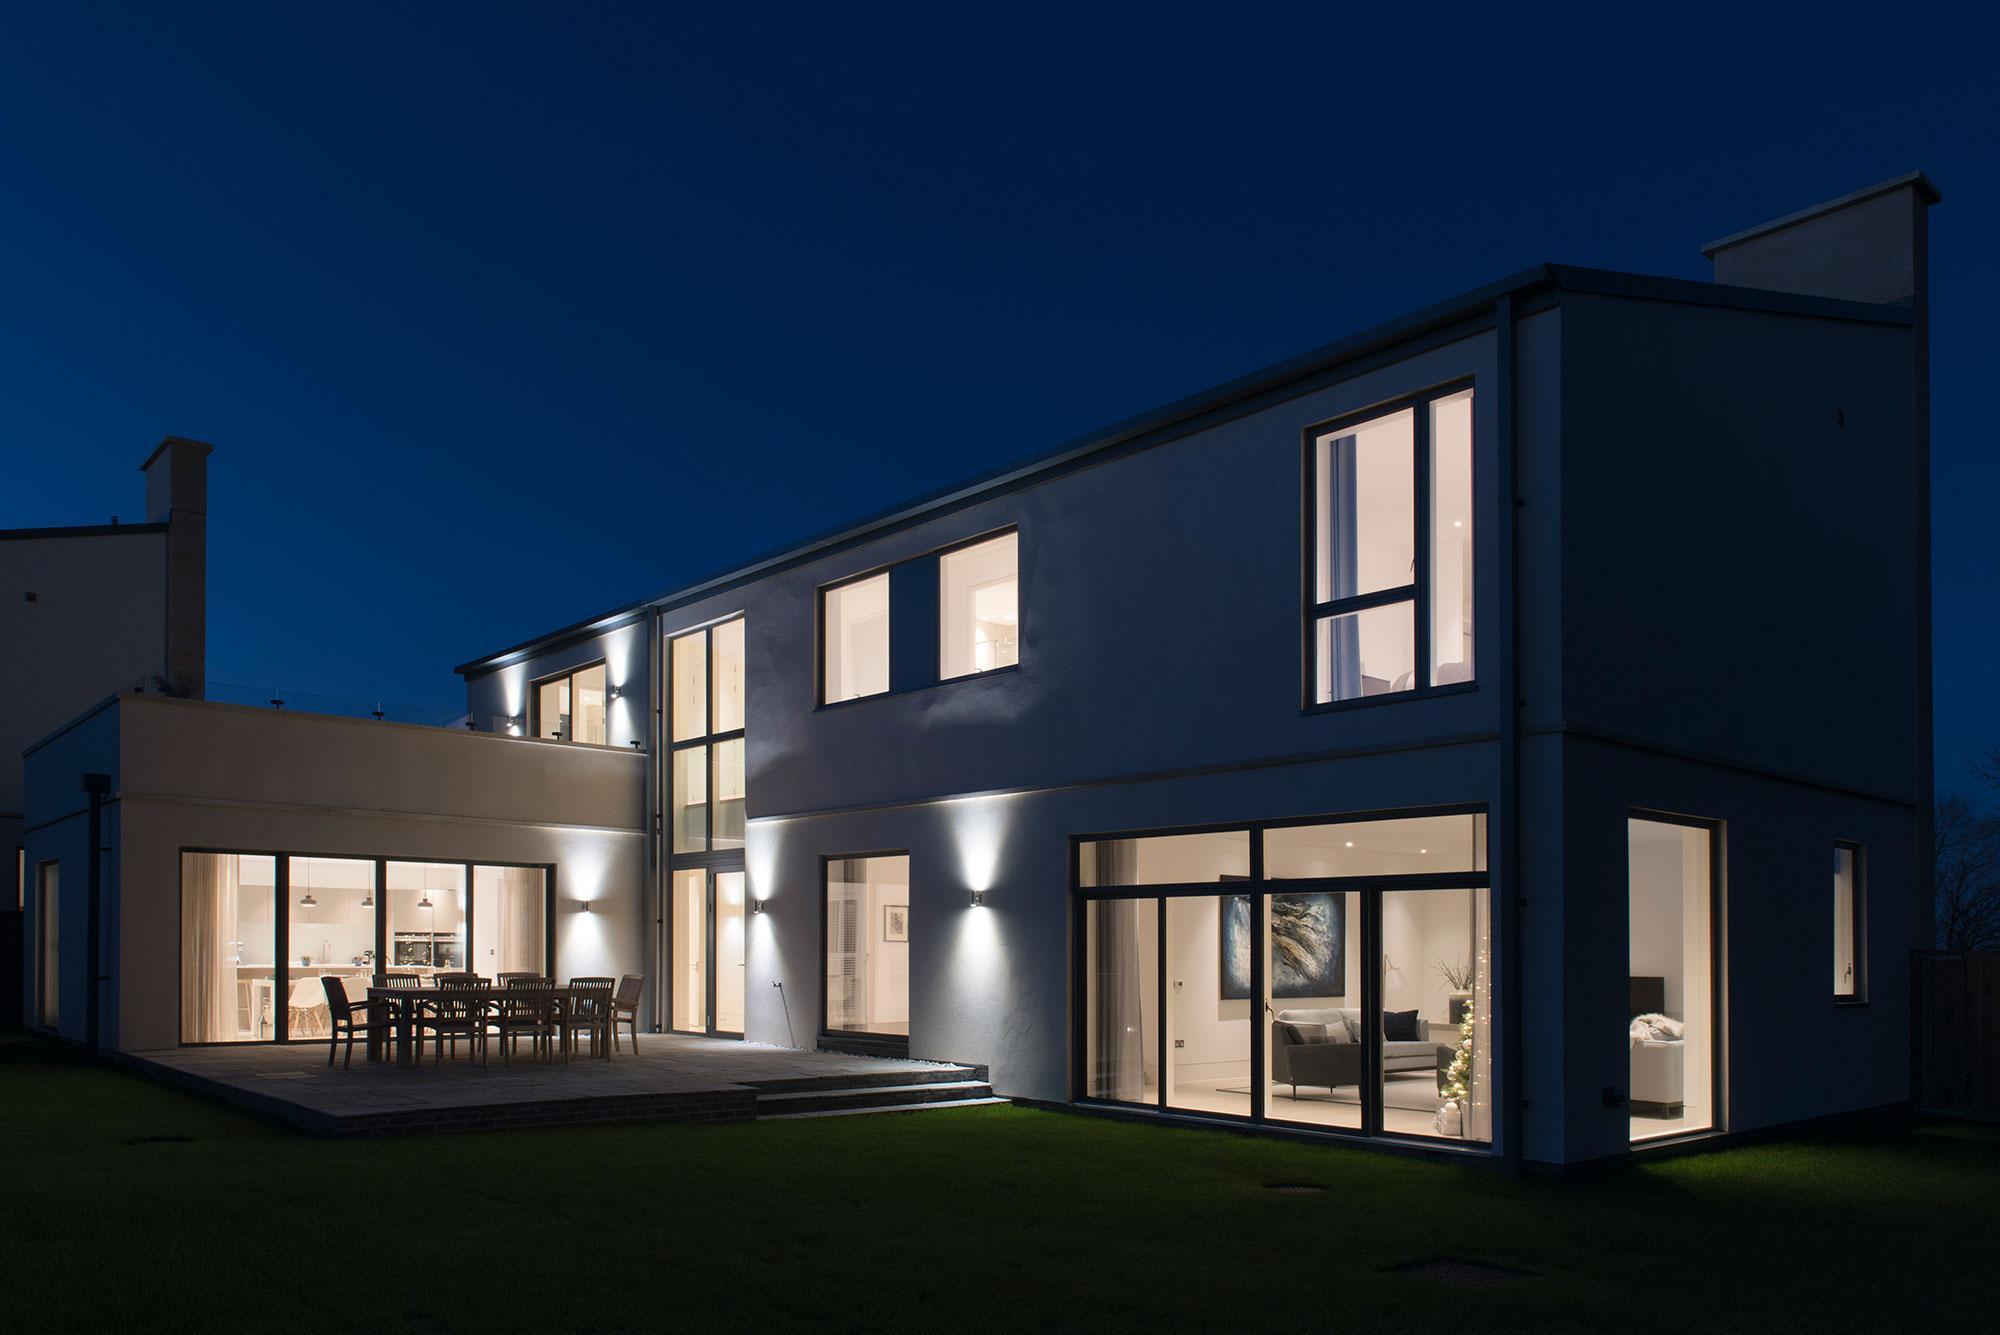 Night image of Tadwick House at Lansdown Fields, Bath